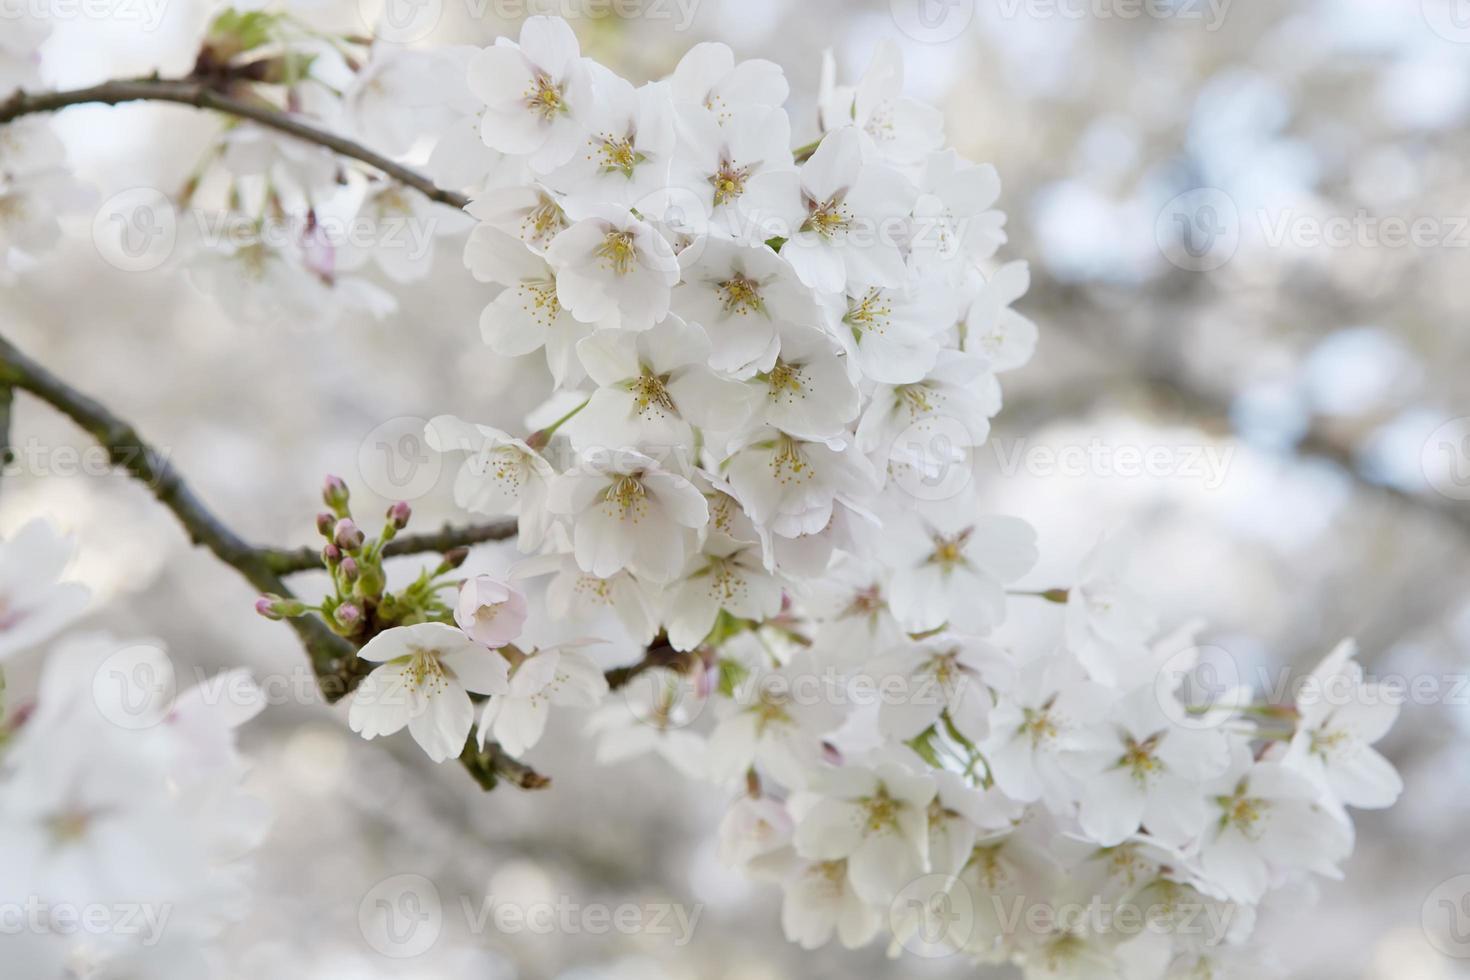 roze kersenbloesem (prunus serrulata) tegen blauwe hemel foto